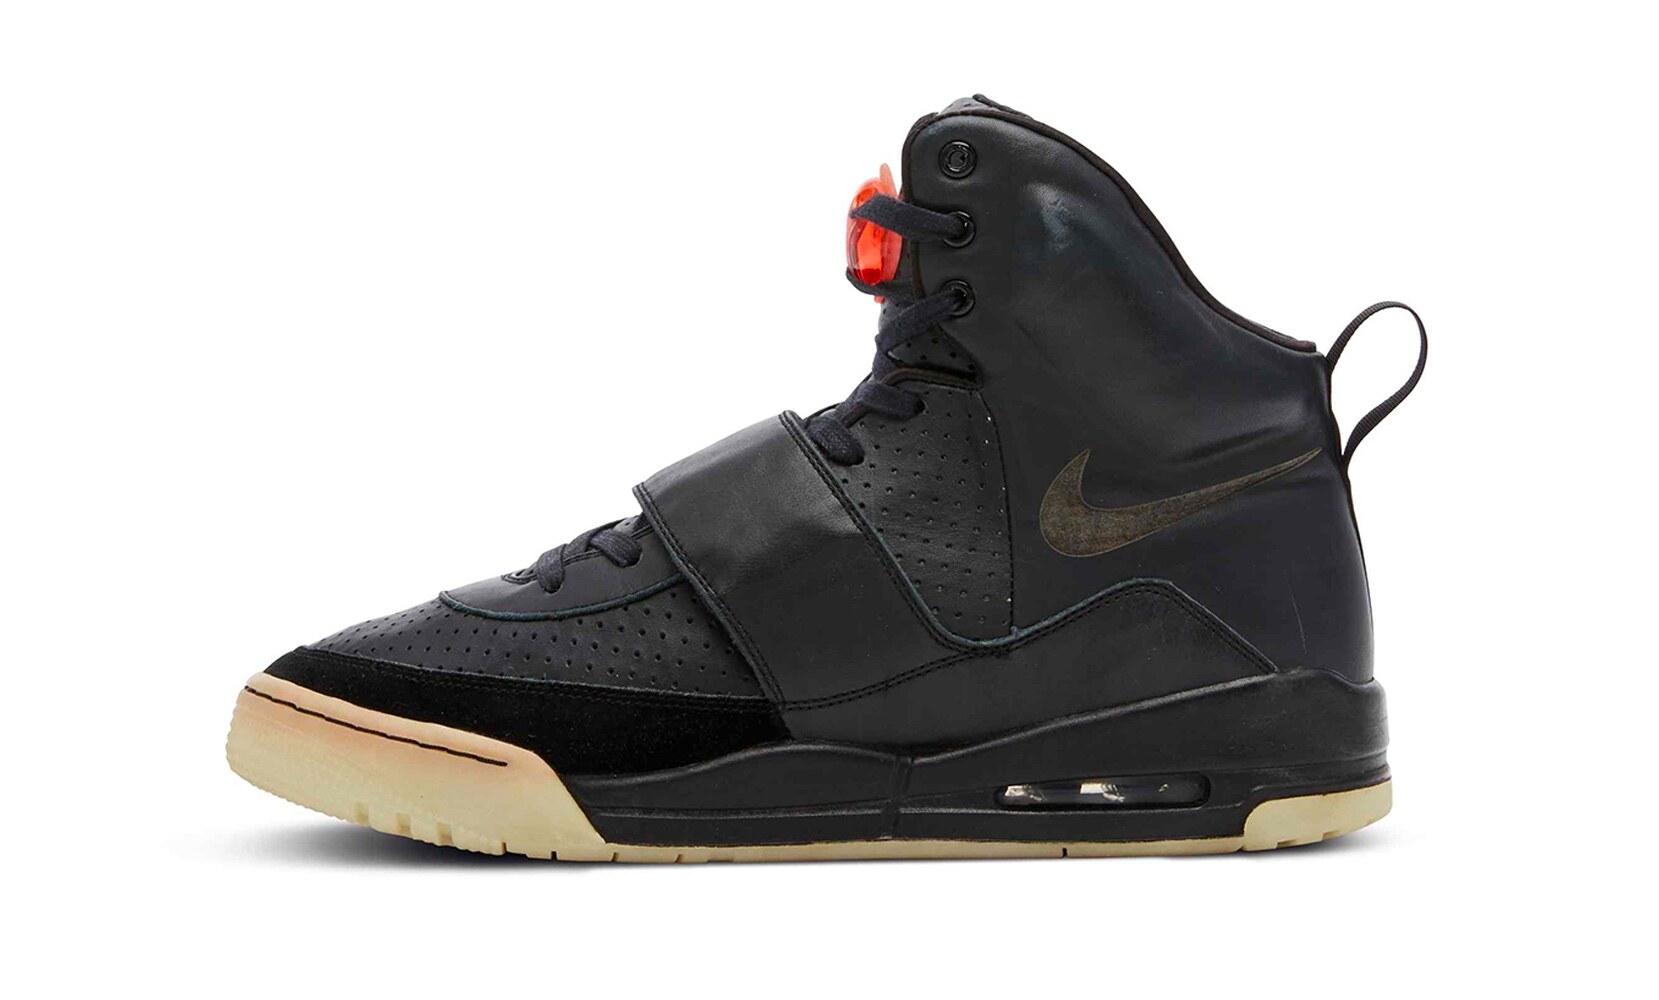 Nike Air Yeezy 1